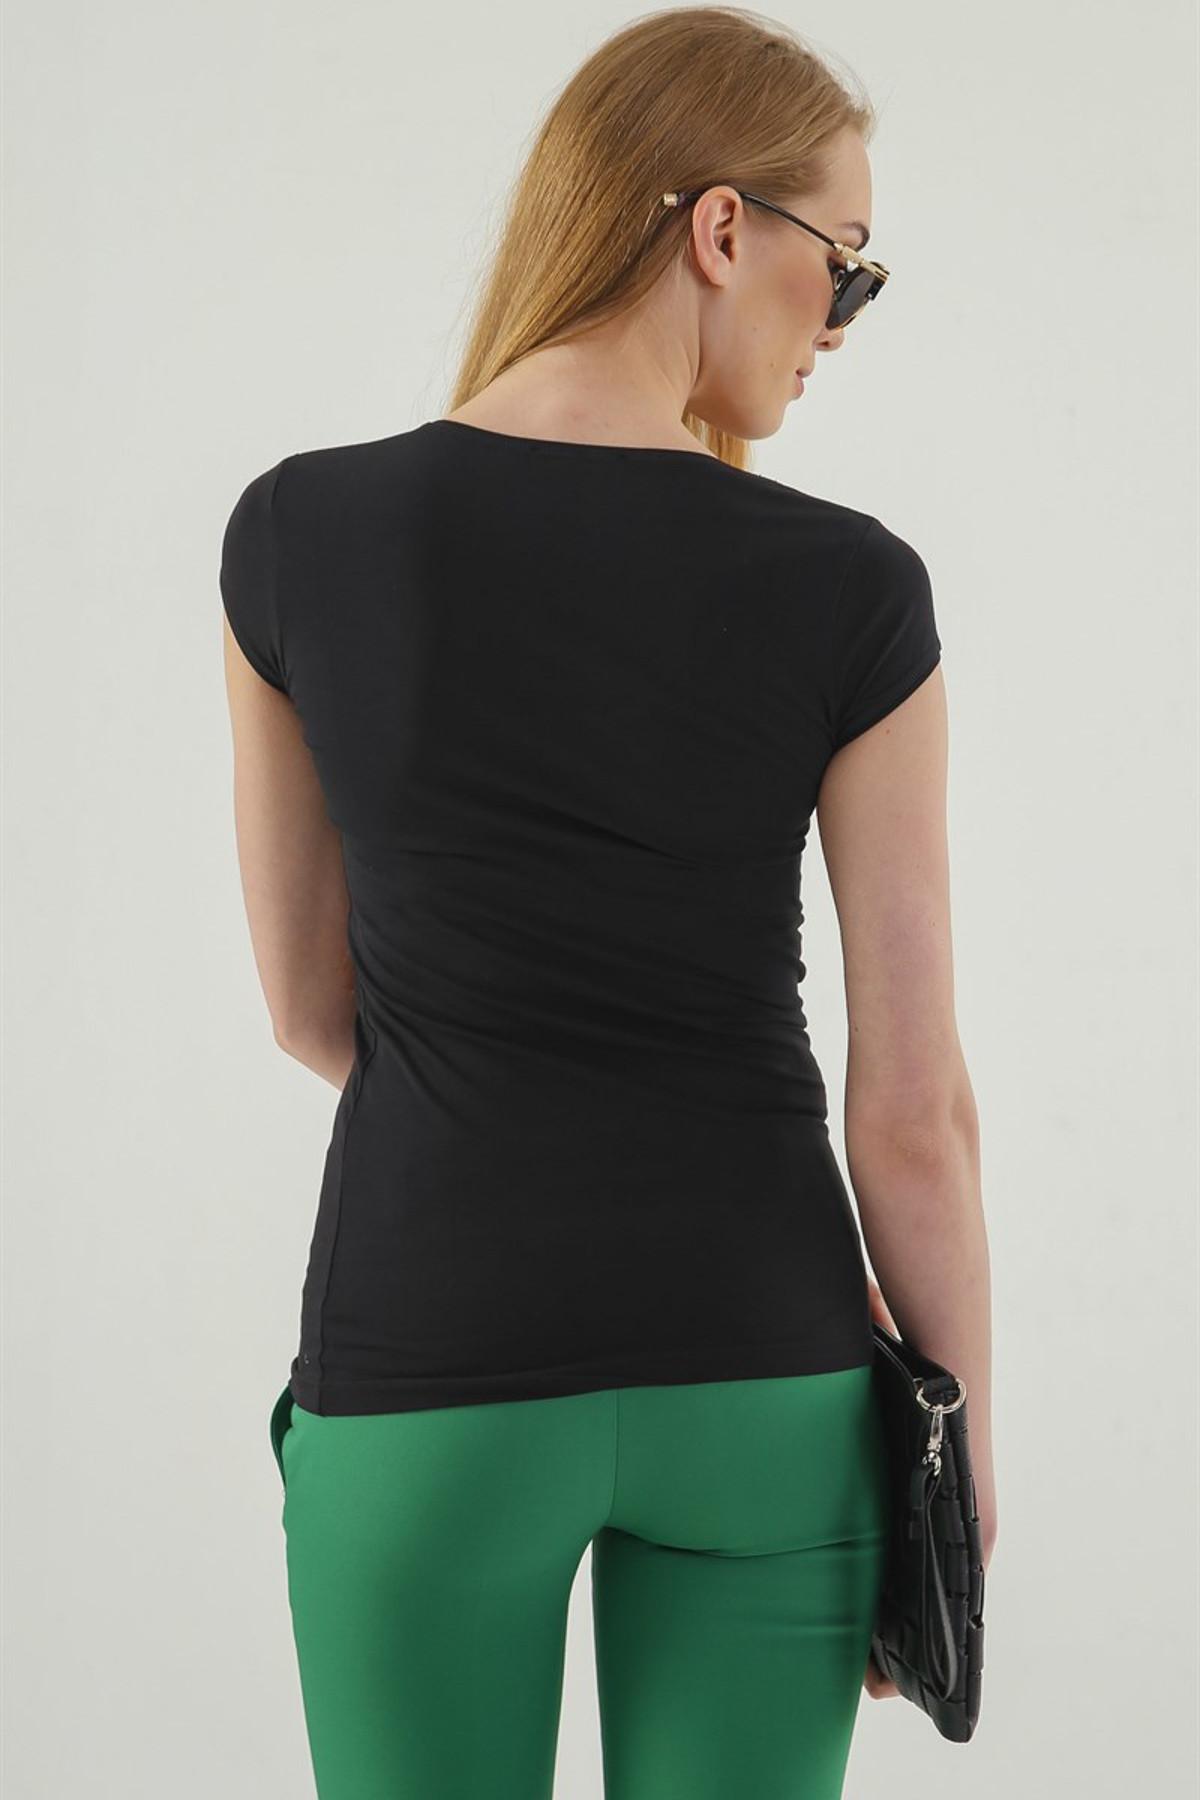 Jument Kadın Siyah Monalisa Balen Yaka Kısa Kol T-Shirt 5610 2